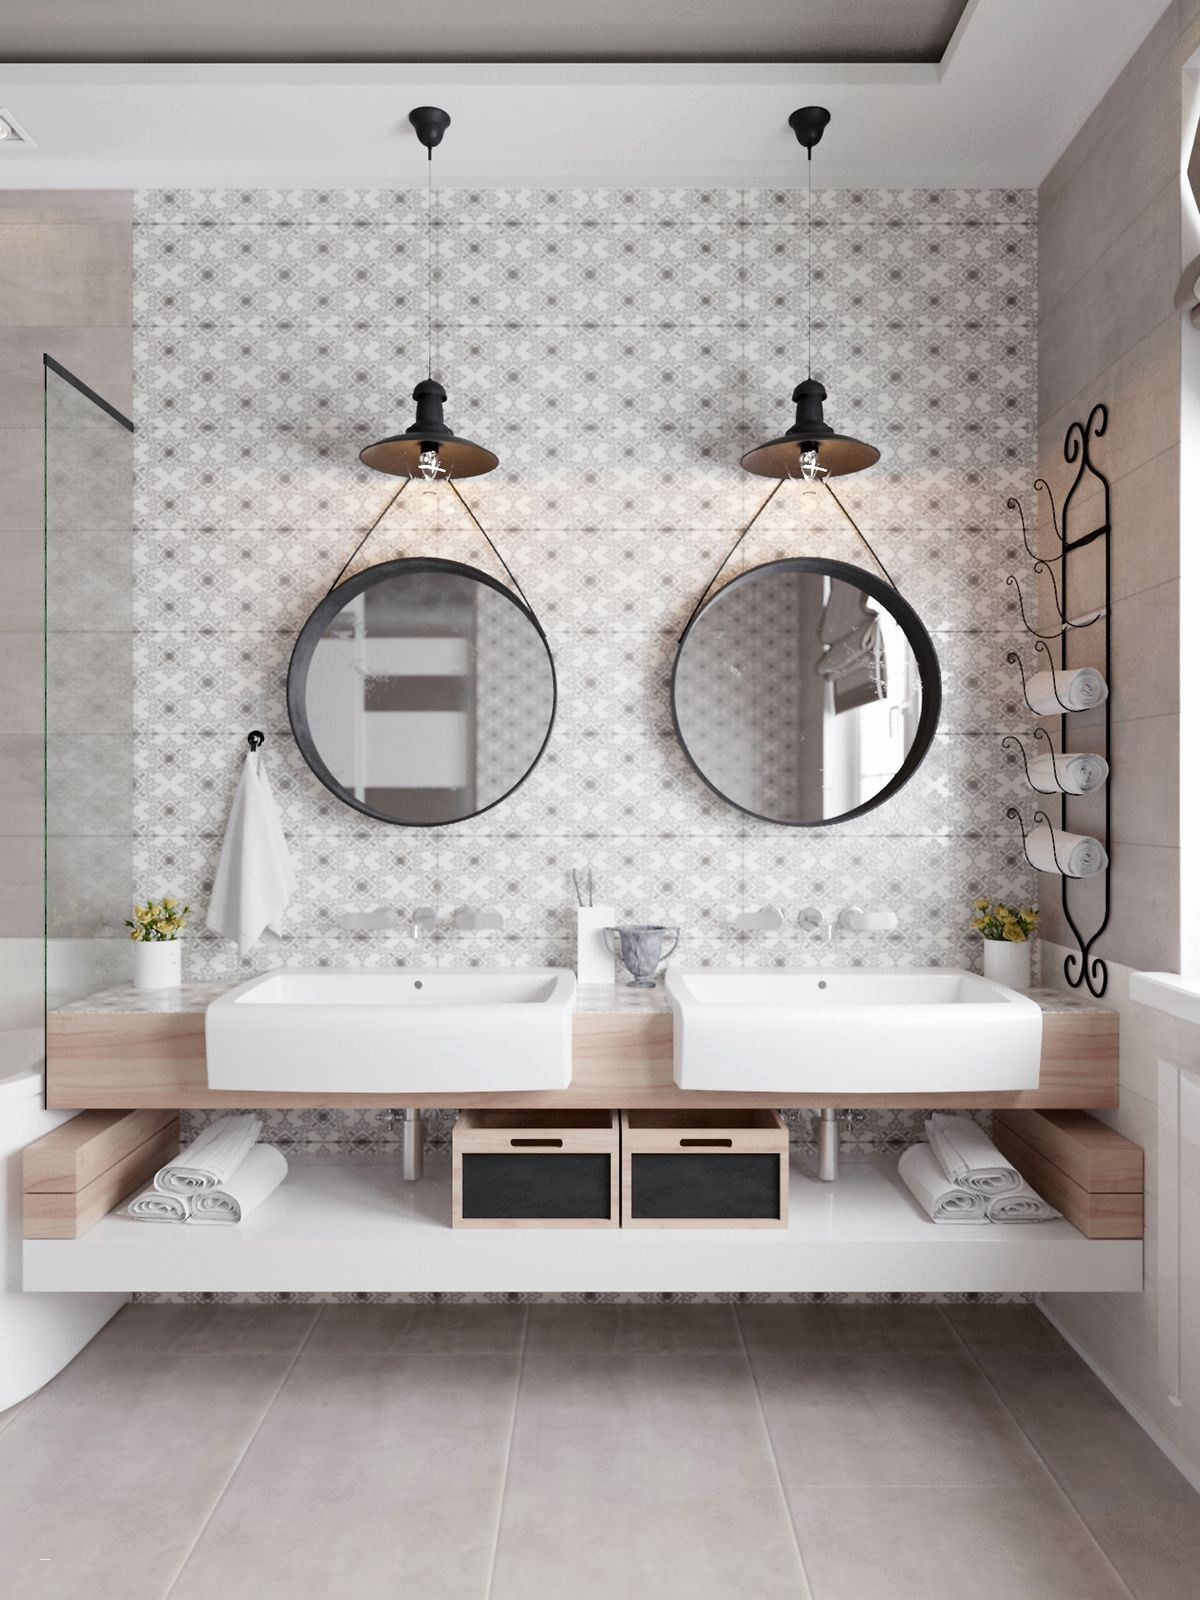 Pinterest Deko Ideen Genial Beispiel Badezimmer Genial Fliesen